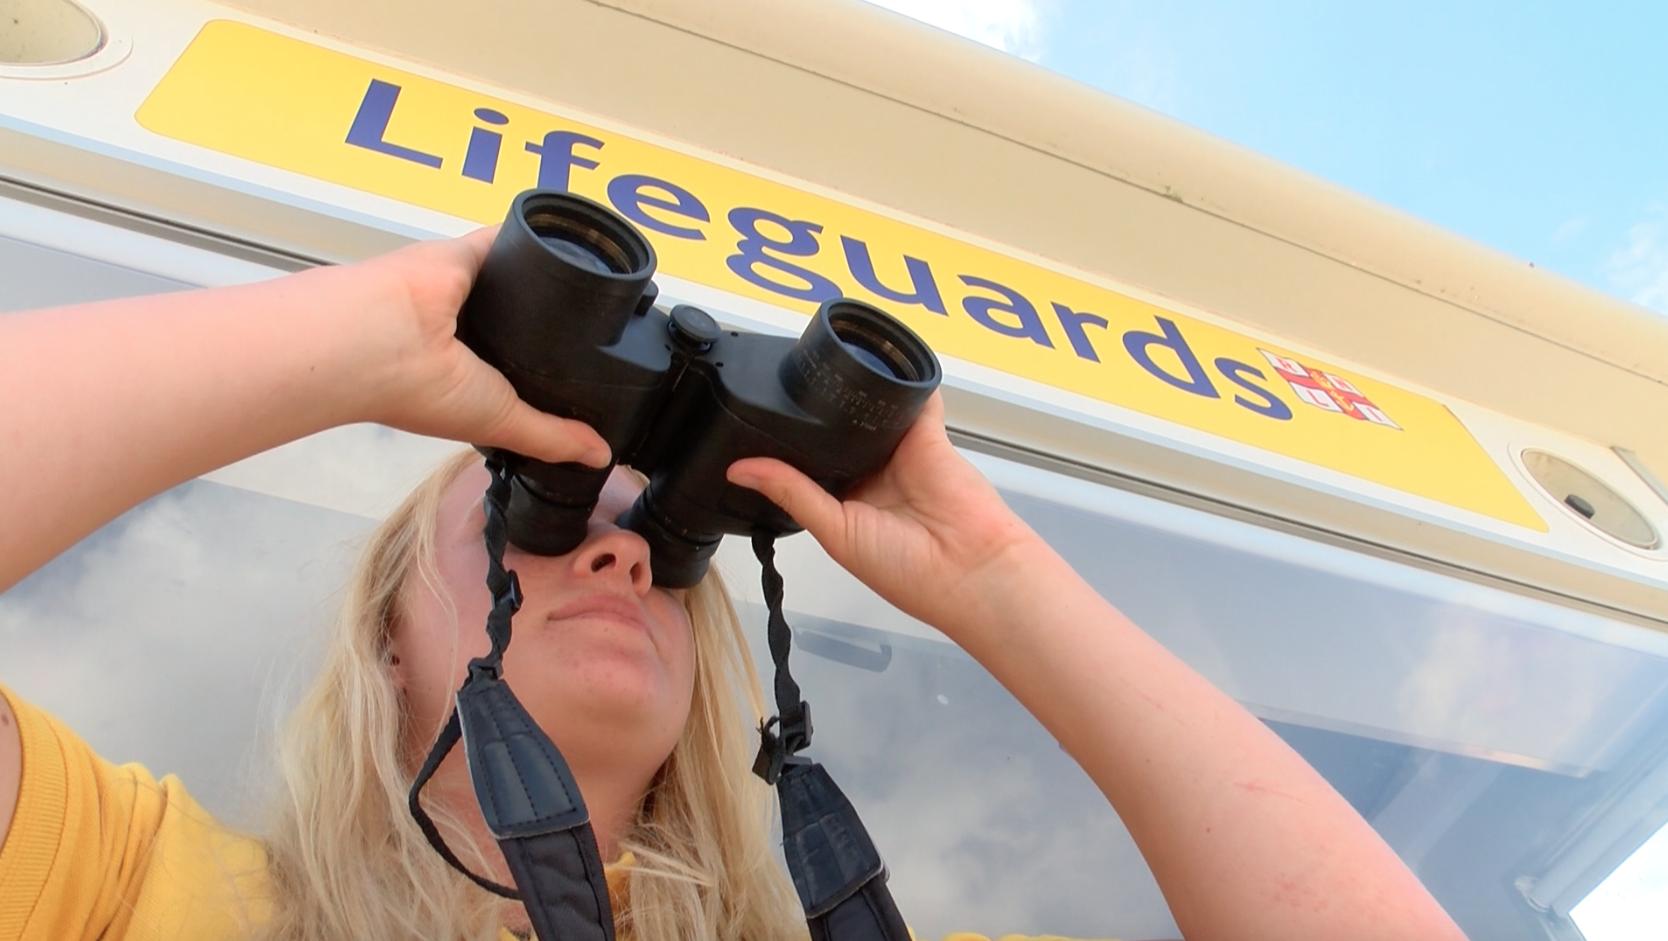 Lifeguard on duty on Weymouth beach